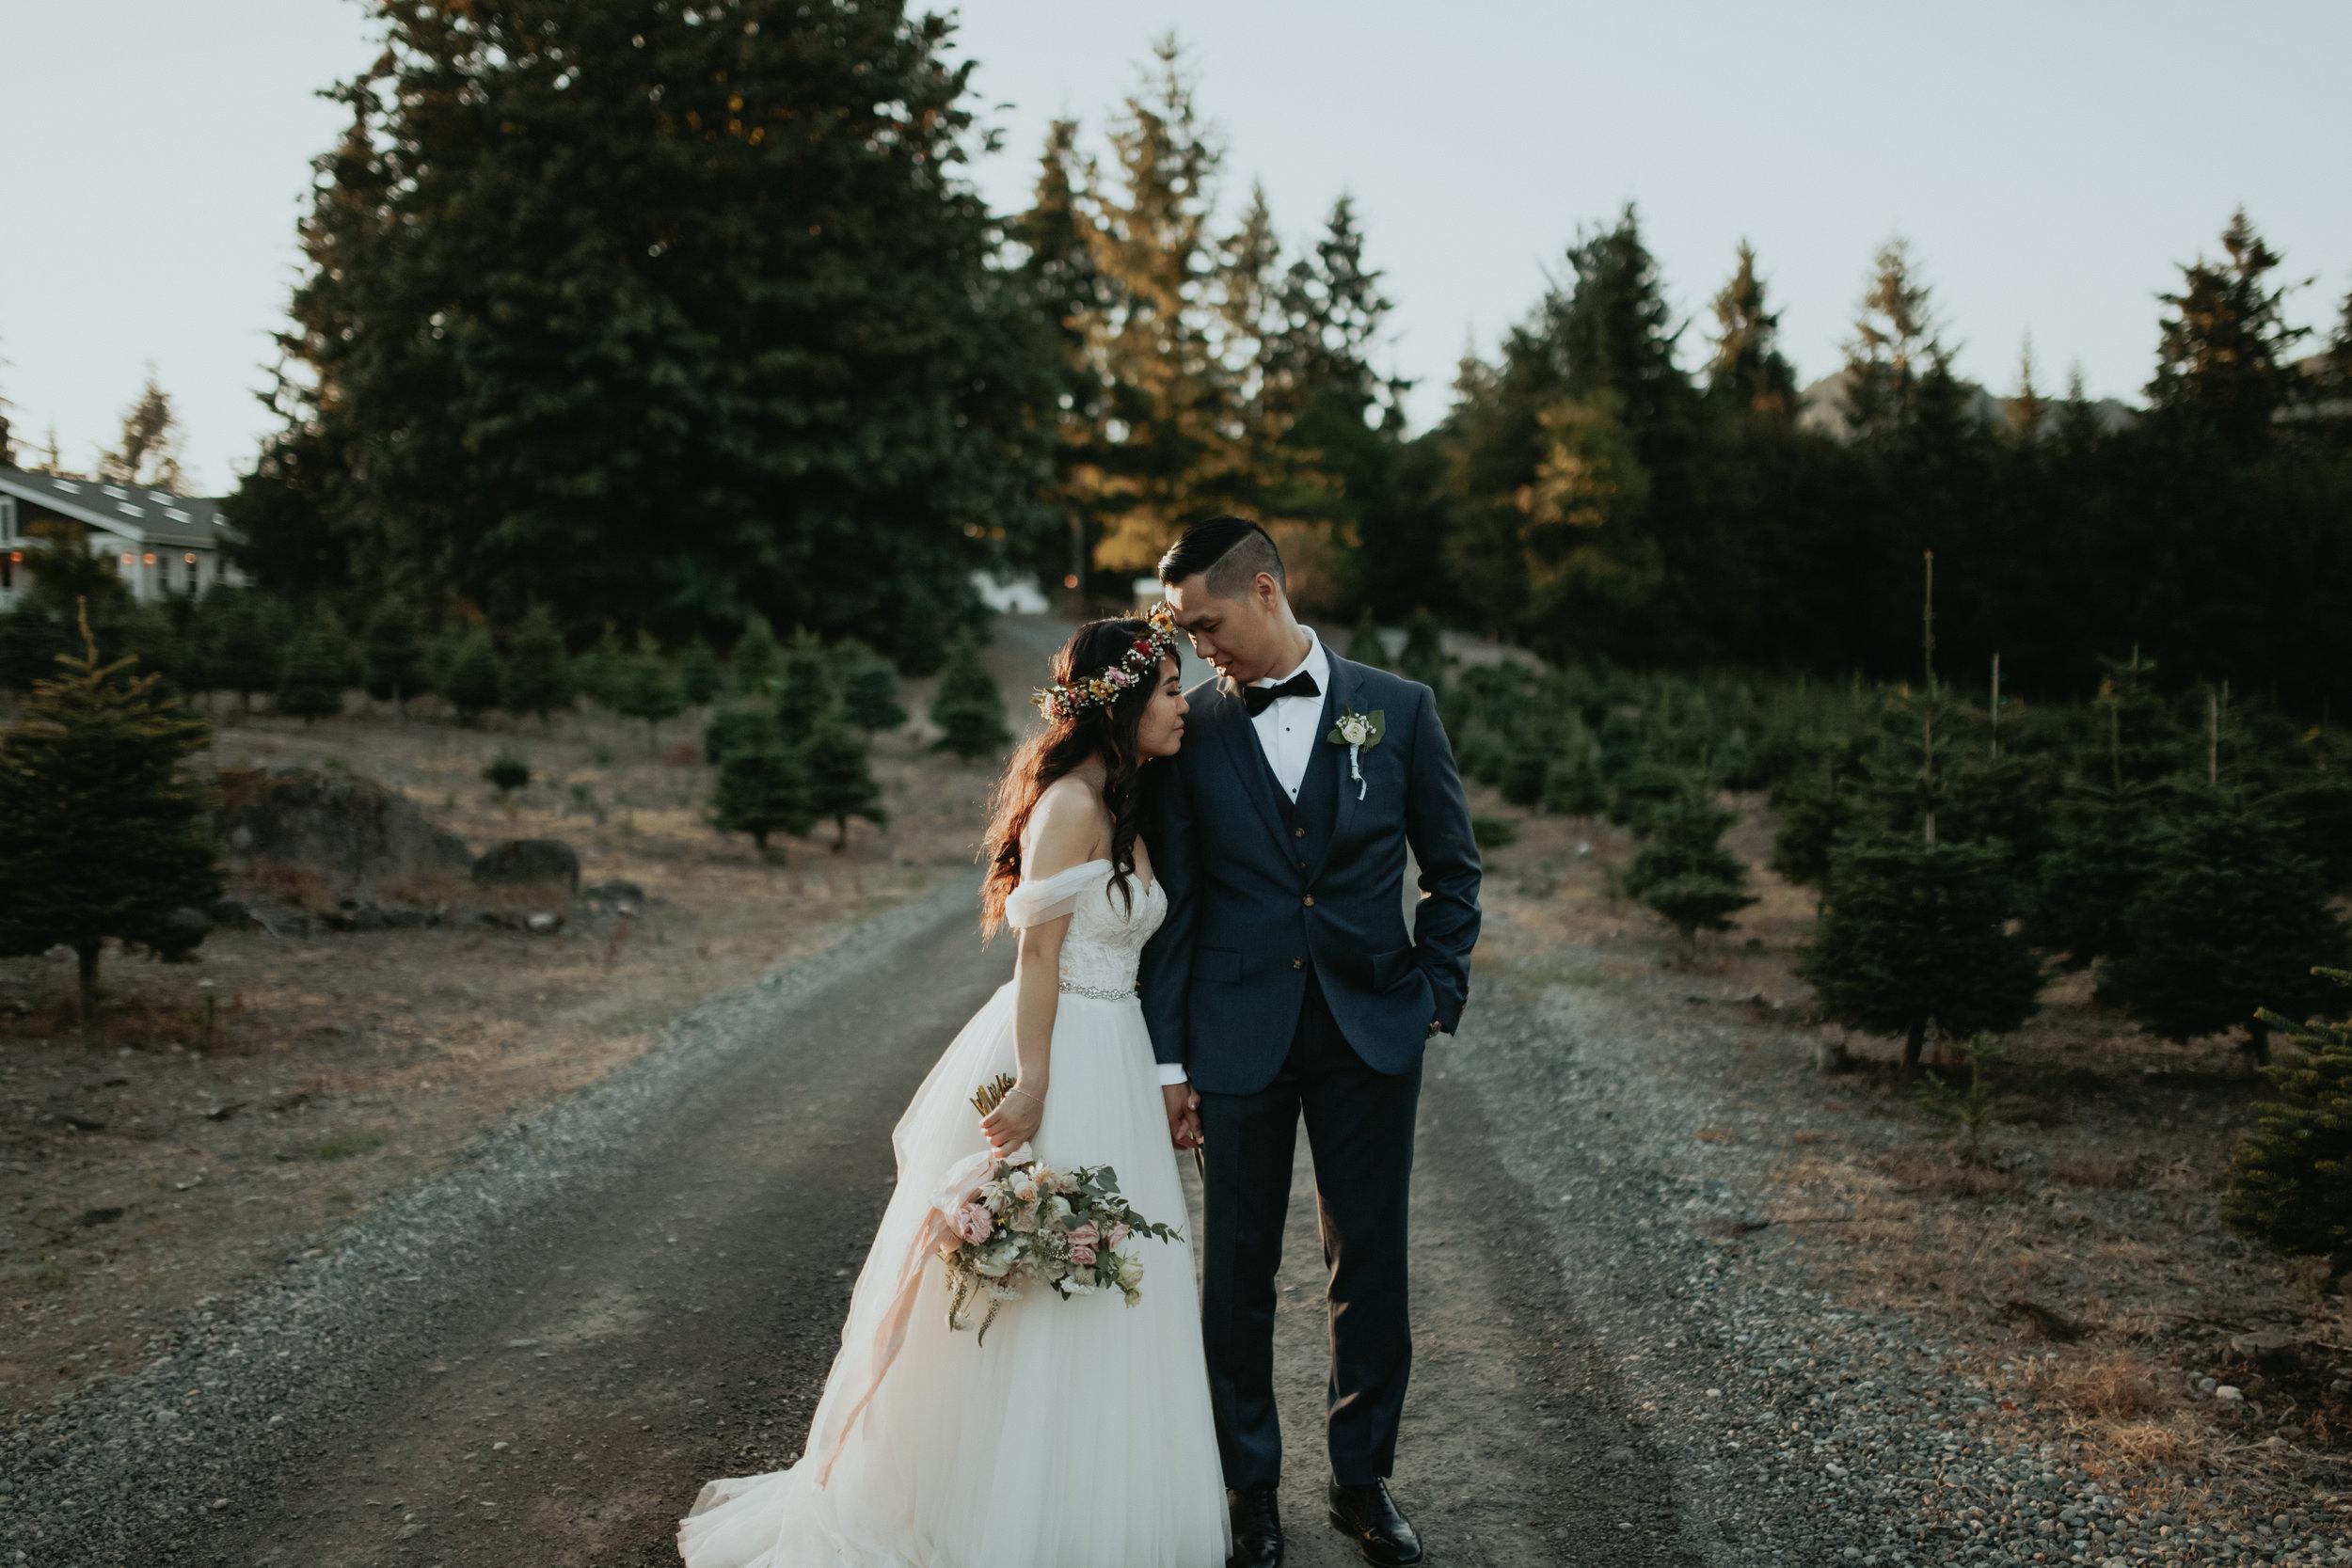 seattle wedding photographer   olympia, wa   small wedding   small wedding venues seattle   intimate wedding photographer   trinity tree farm